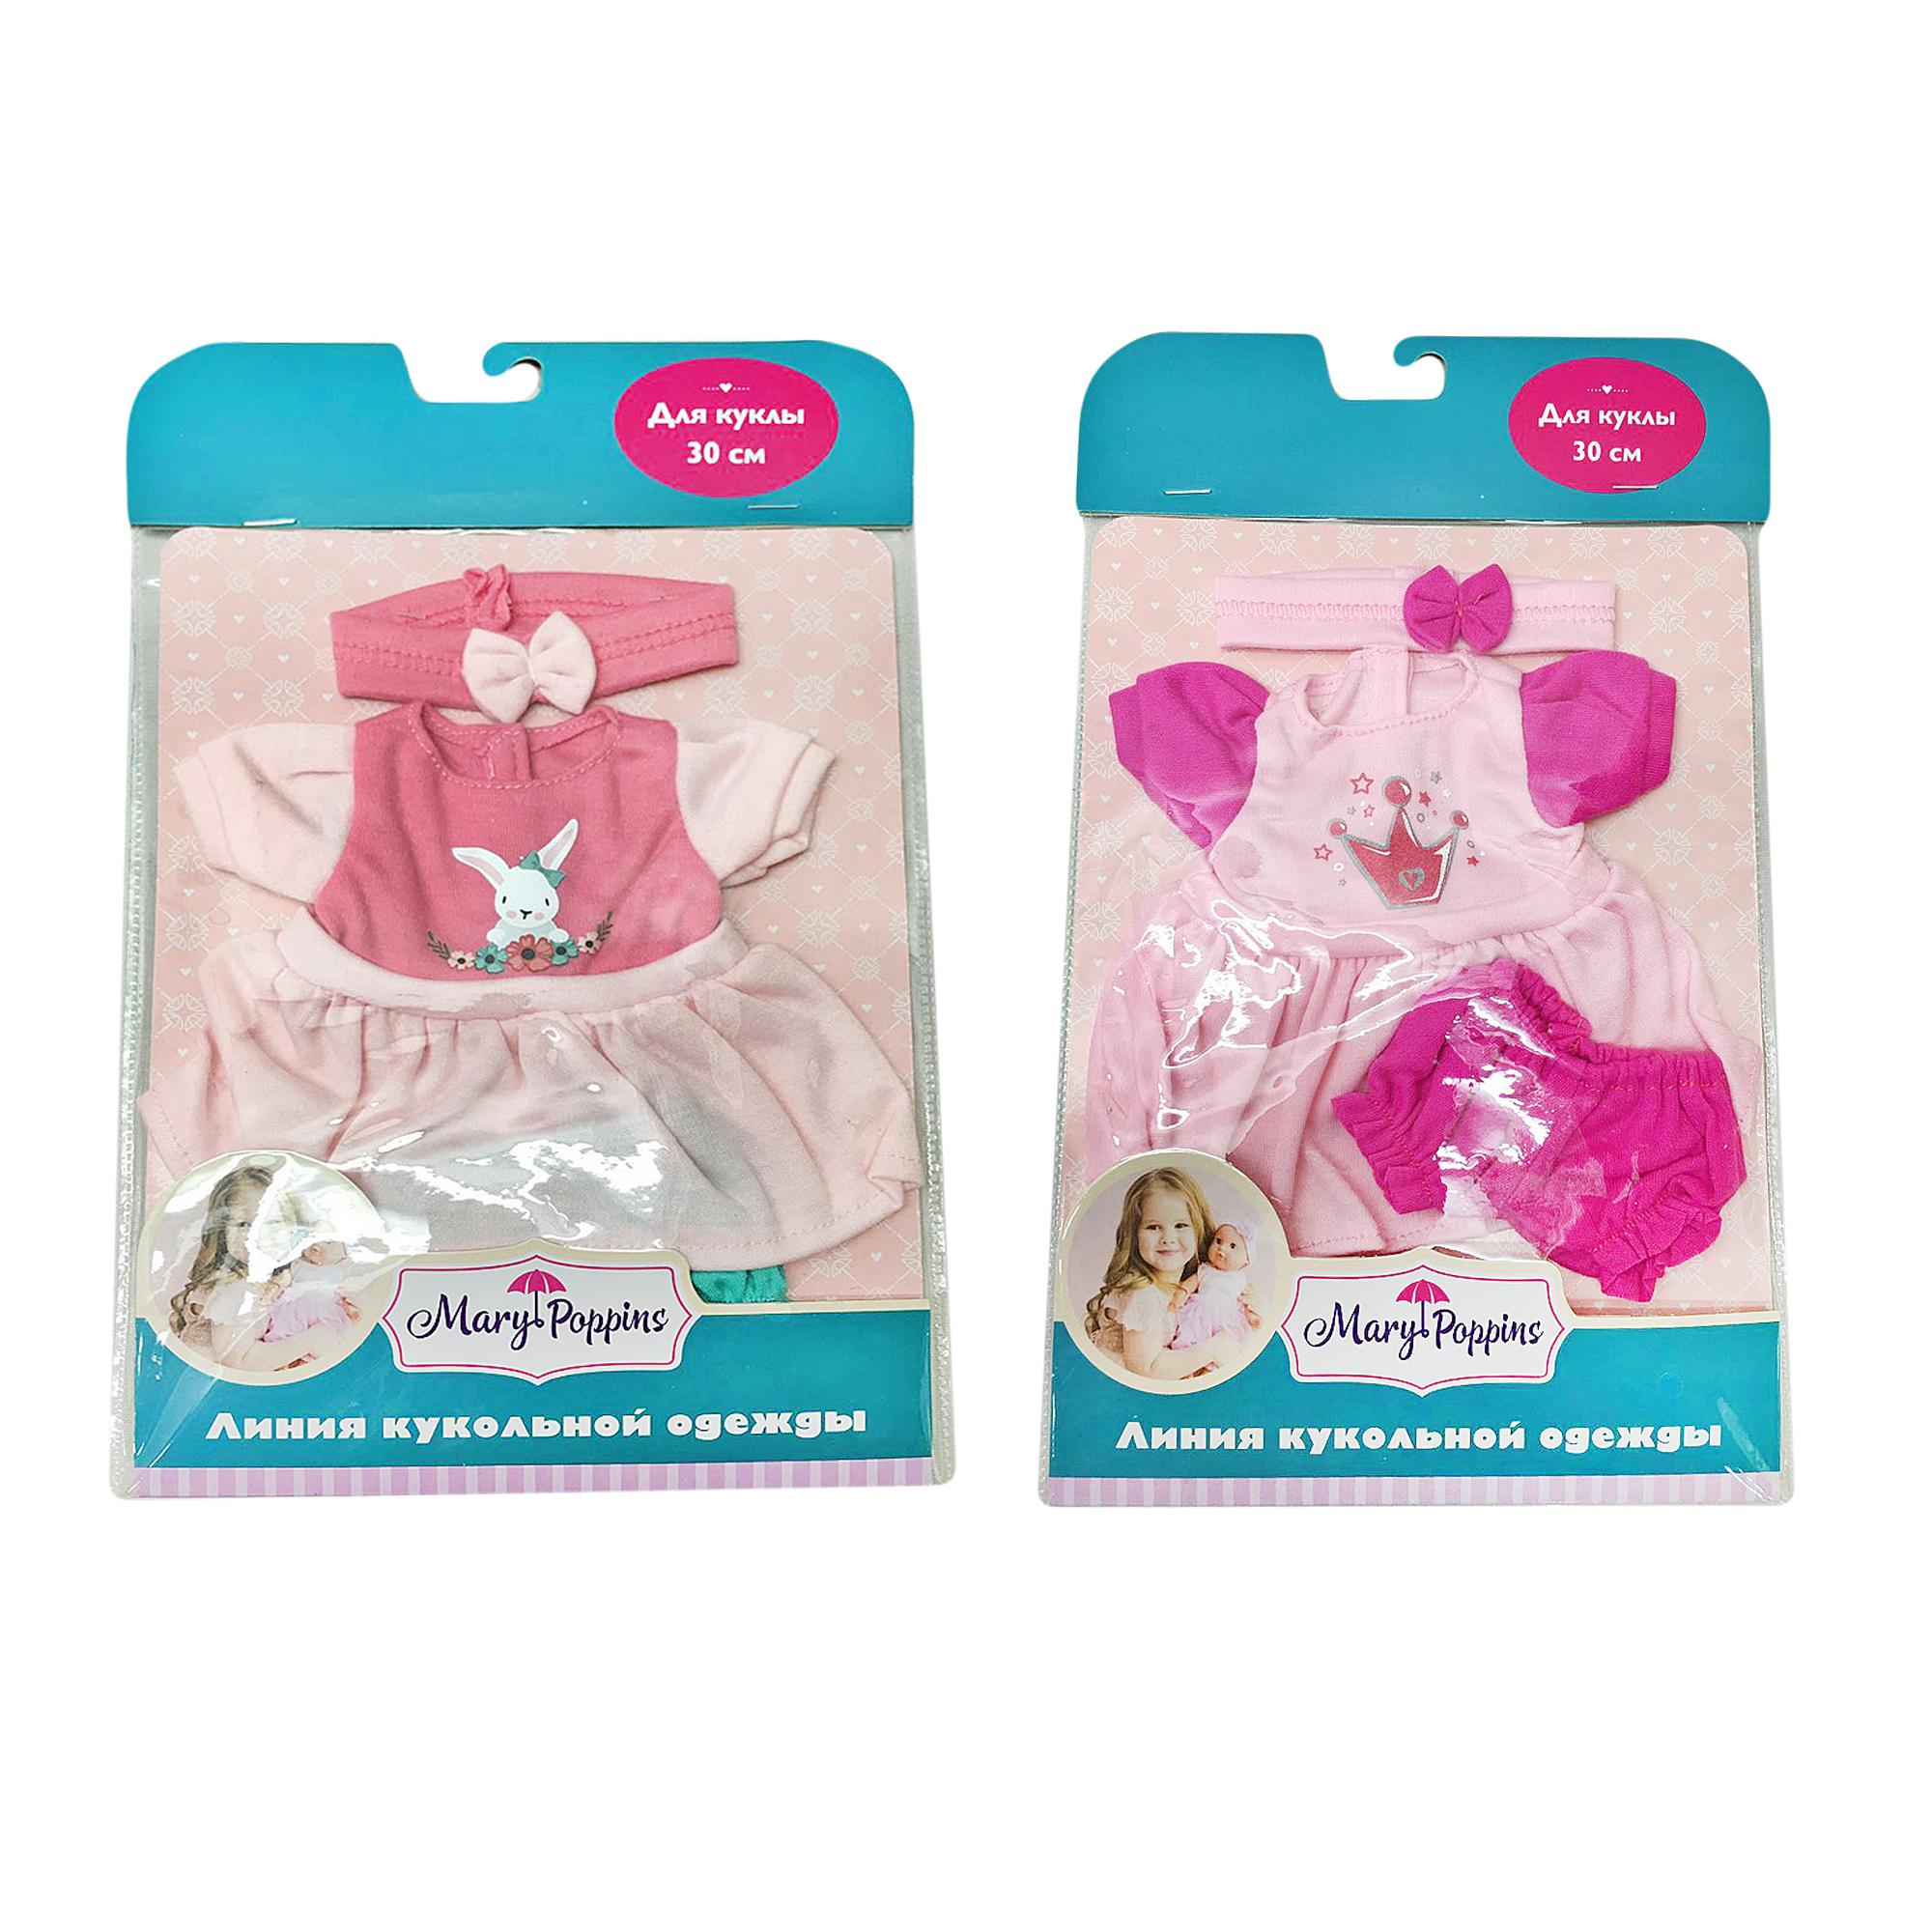 Одежда для кукол Mary Poppins Одежда для куклы Mary Poppins 30 см платье, штанишки и повязка в асс. куклы и одежда для кукол precious кукла невеста брюнетка 30 см